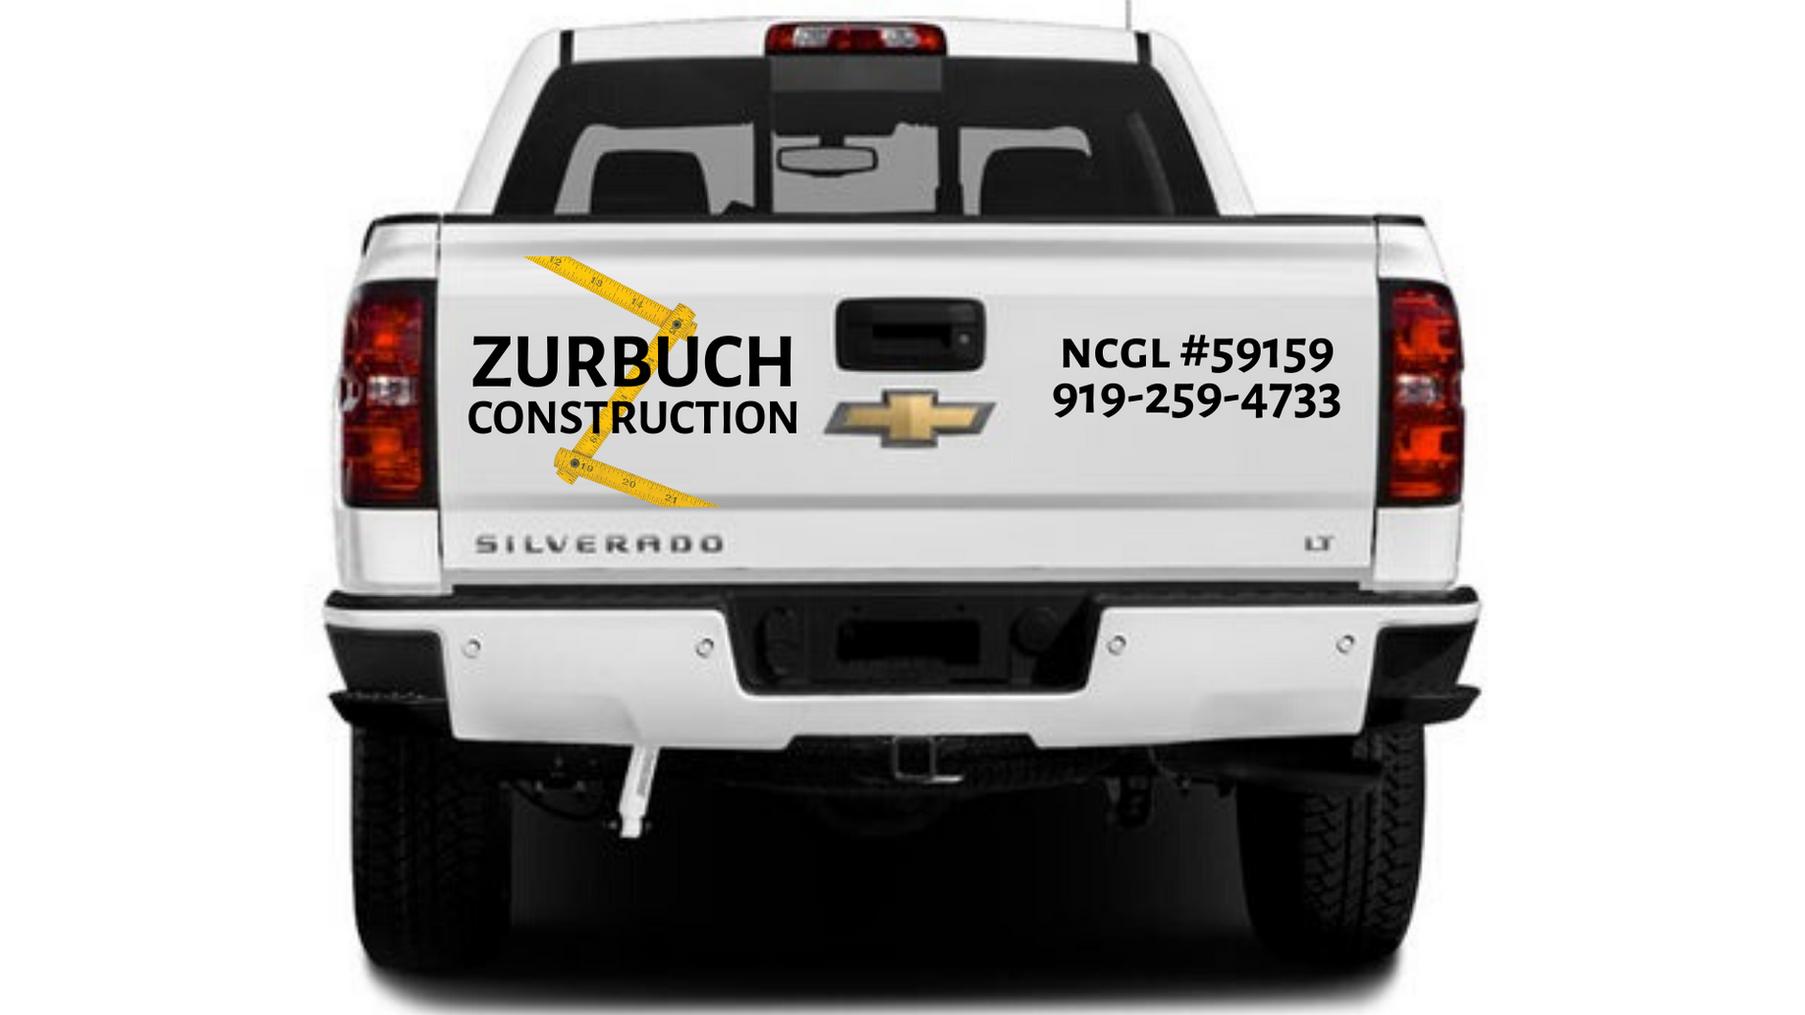 ZURBUCH TAILGATE - Z, NCGL#, Phone .png